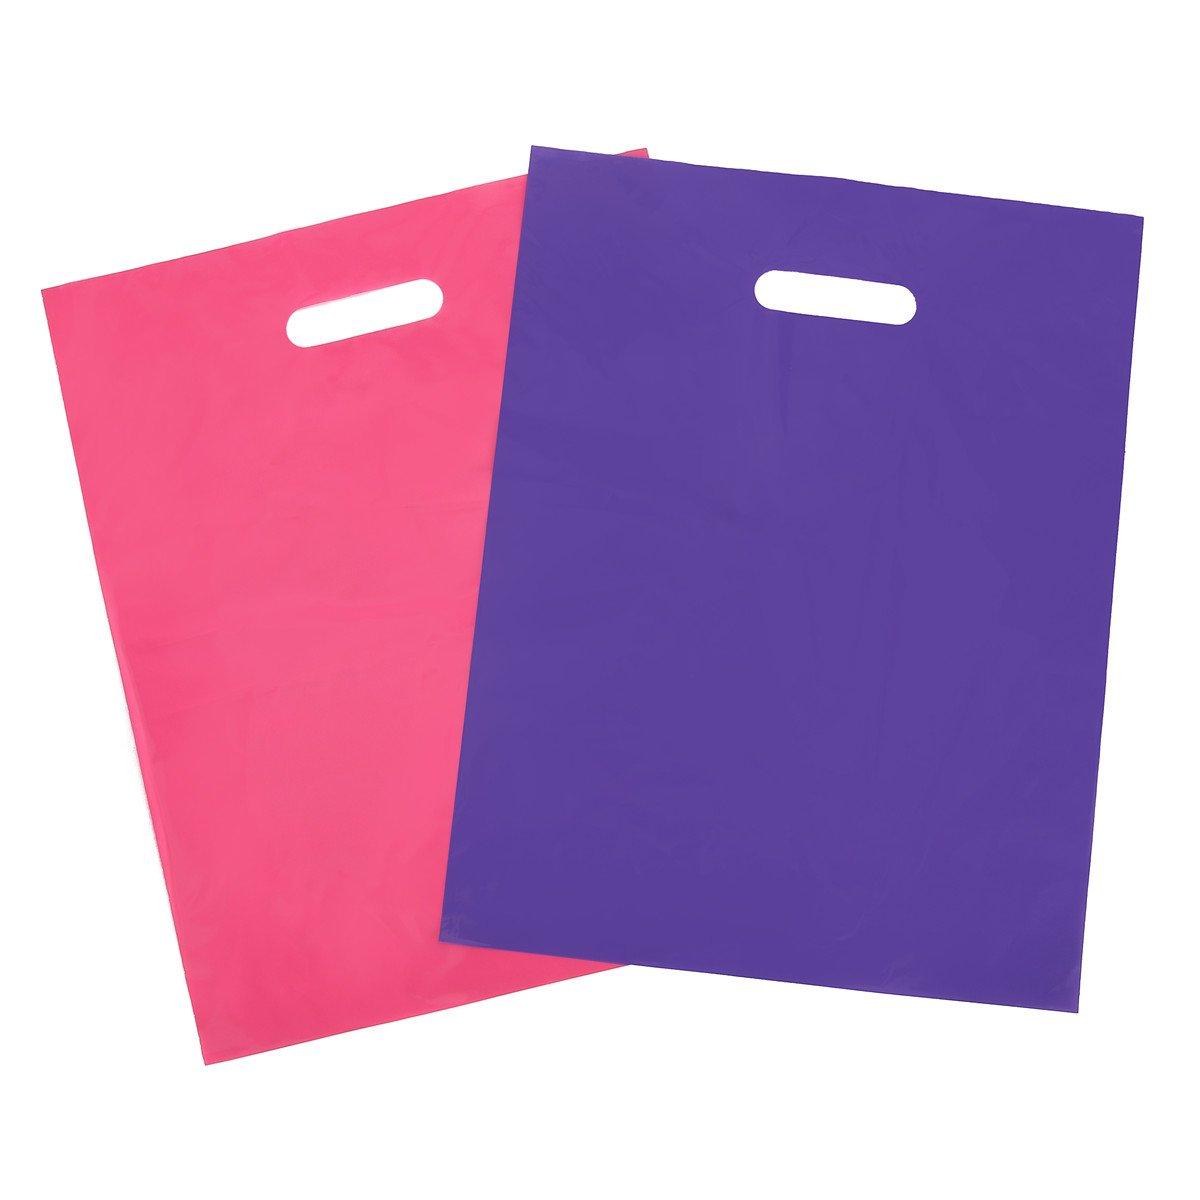 Amazon.com: 100Bolsas 12x15plástico color ...